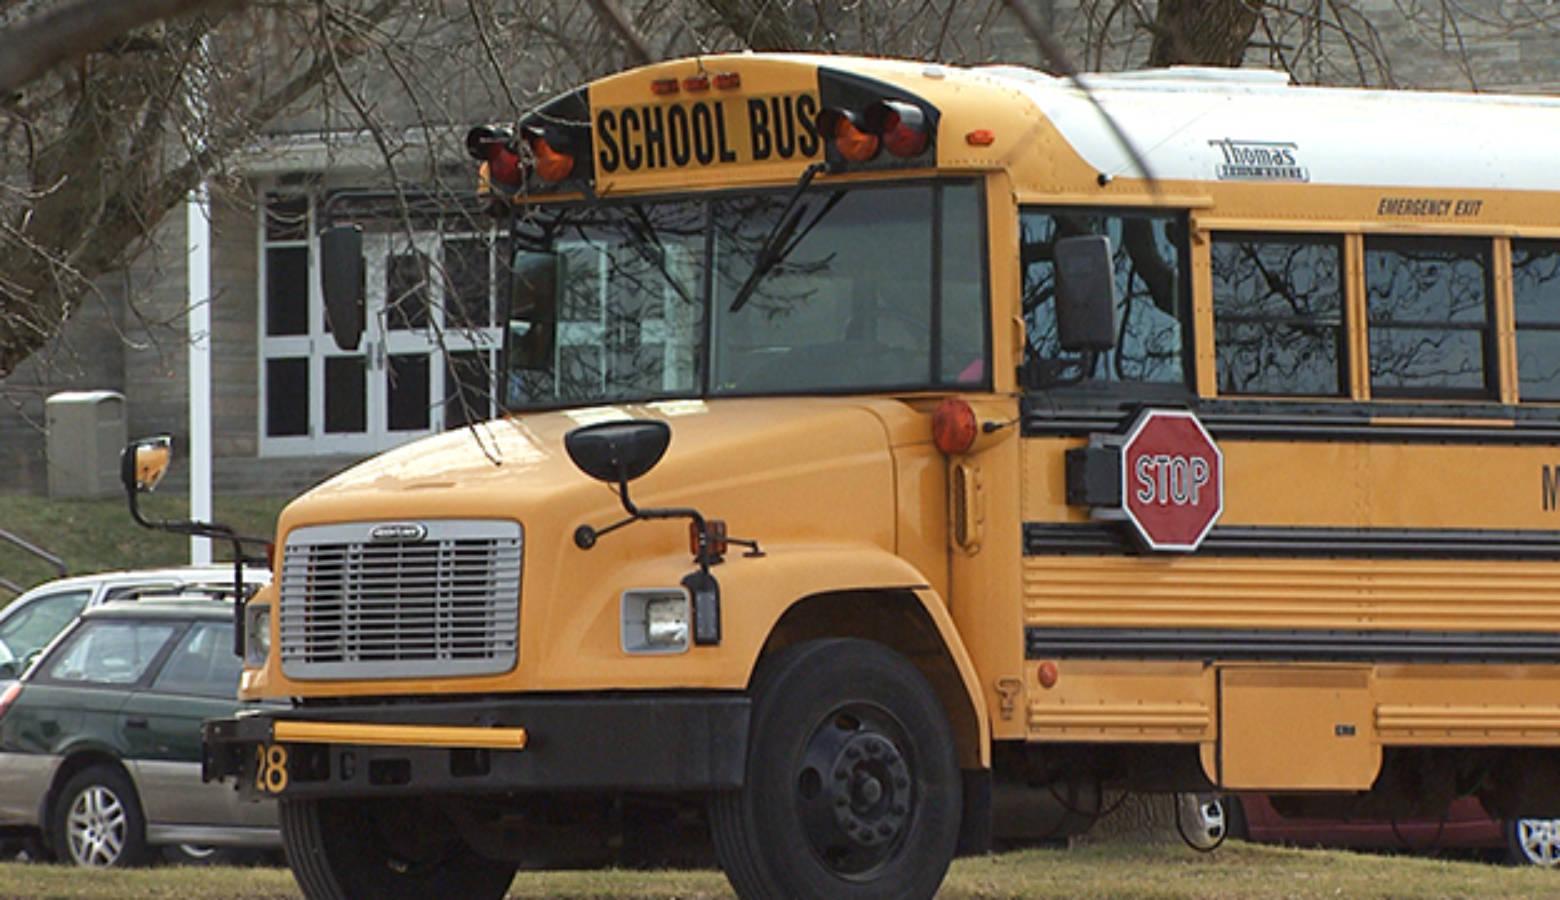 Monroe County Schools Corporation school bus. (WFIU/WTIU)